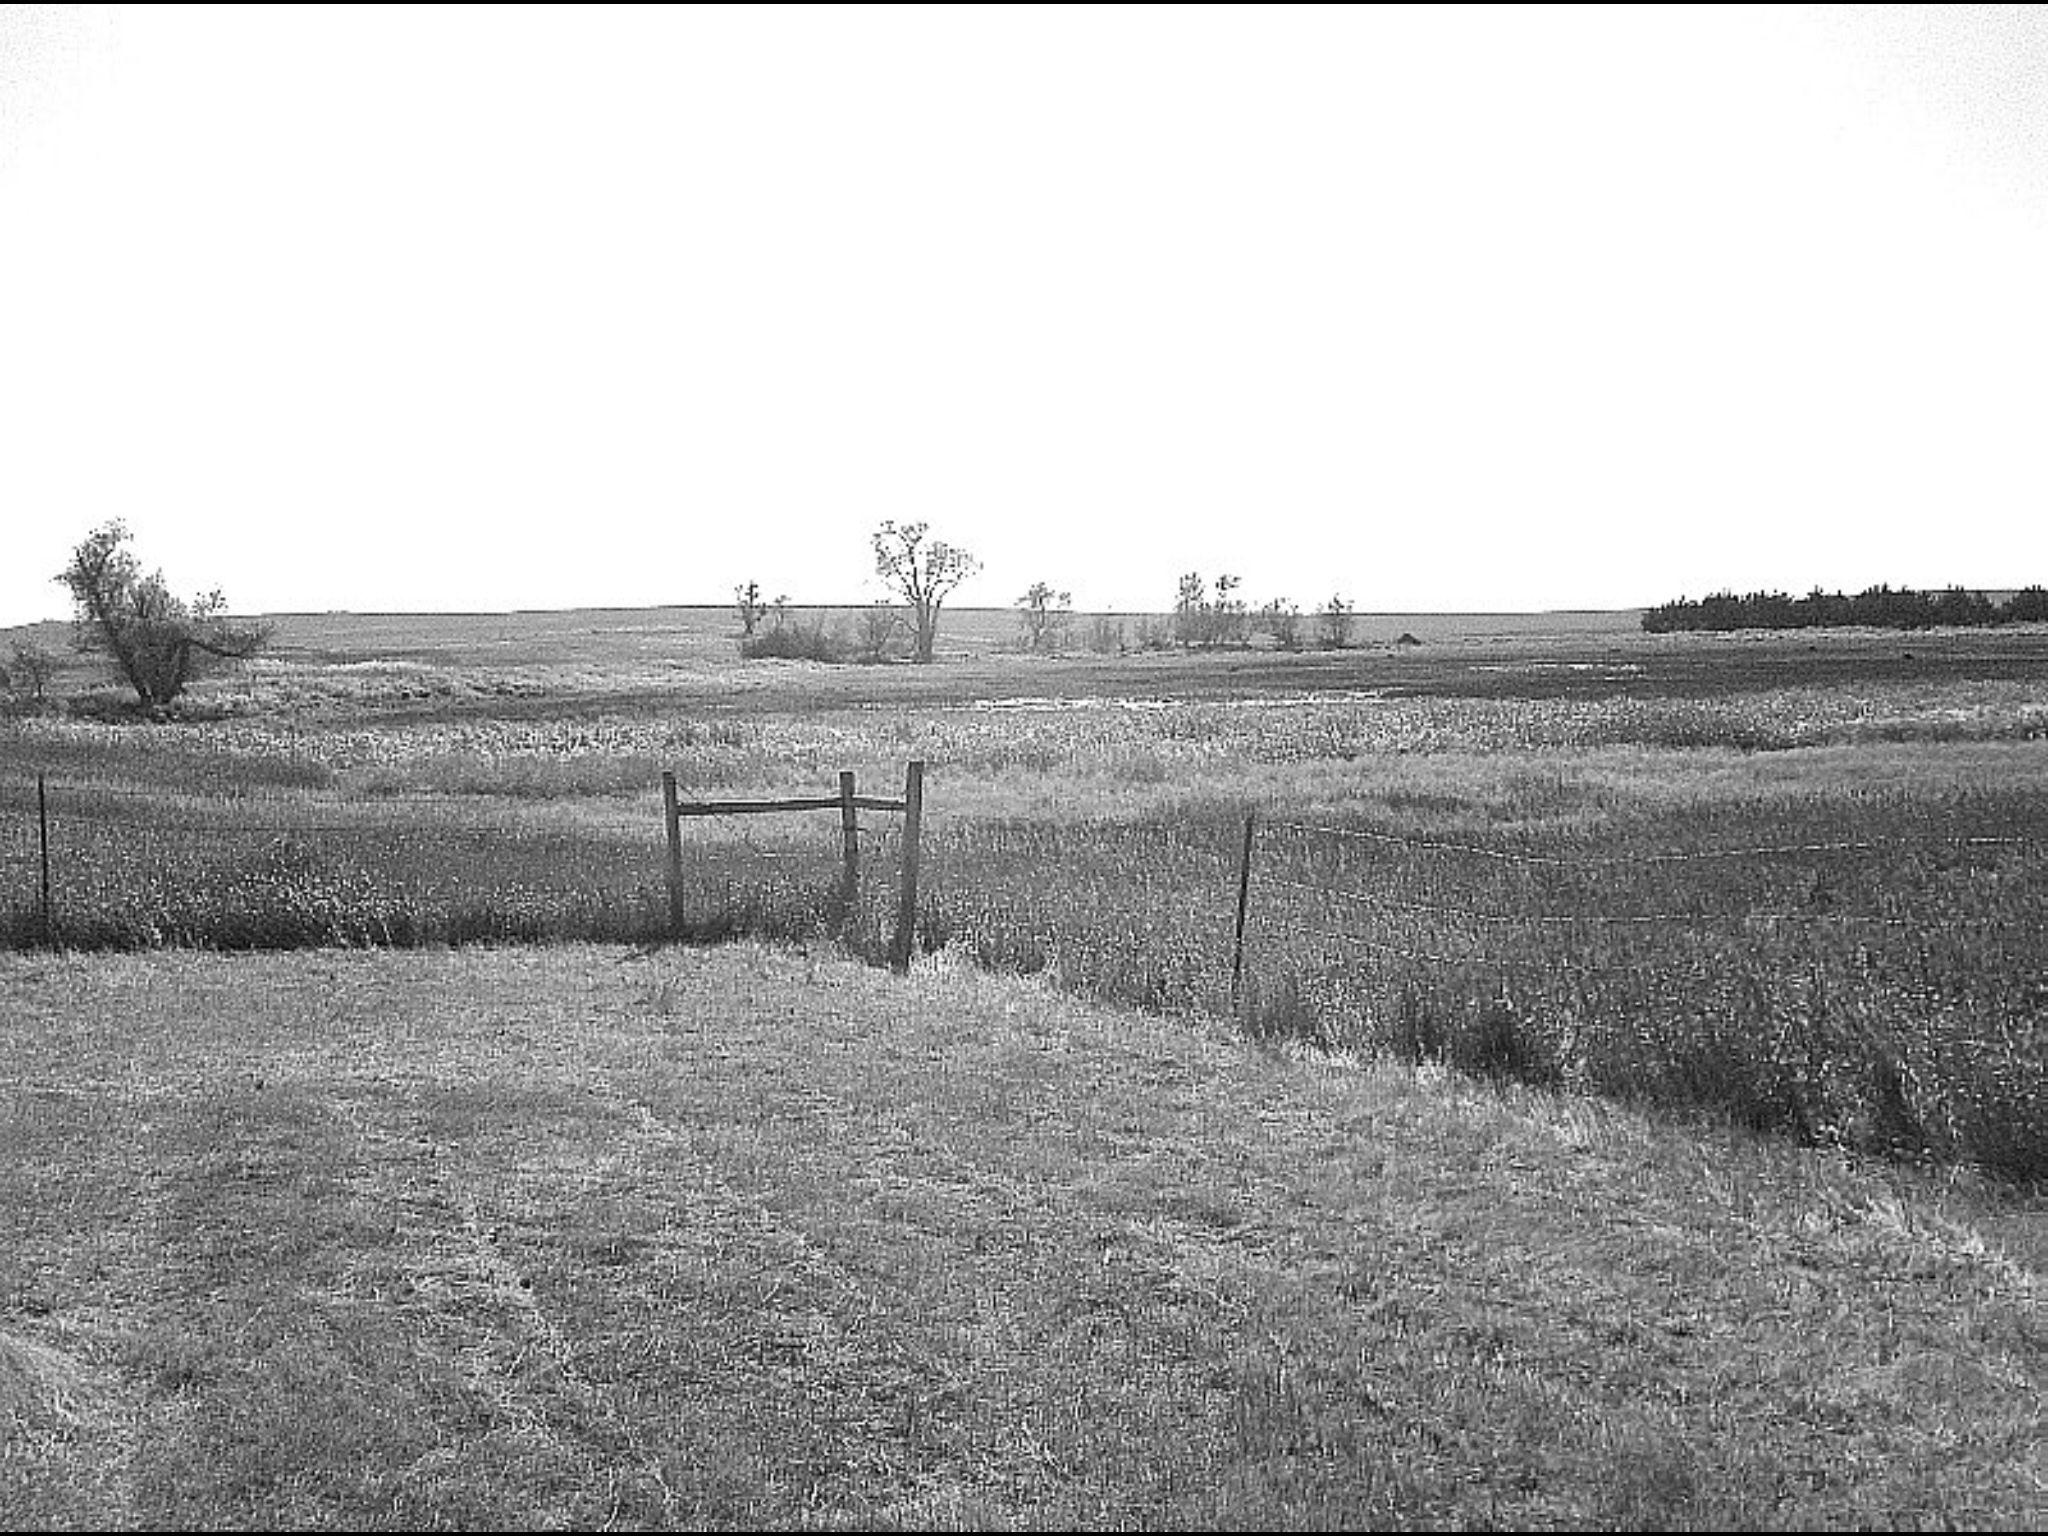 Farm land 2 by emilyann28